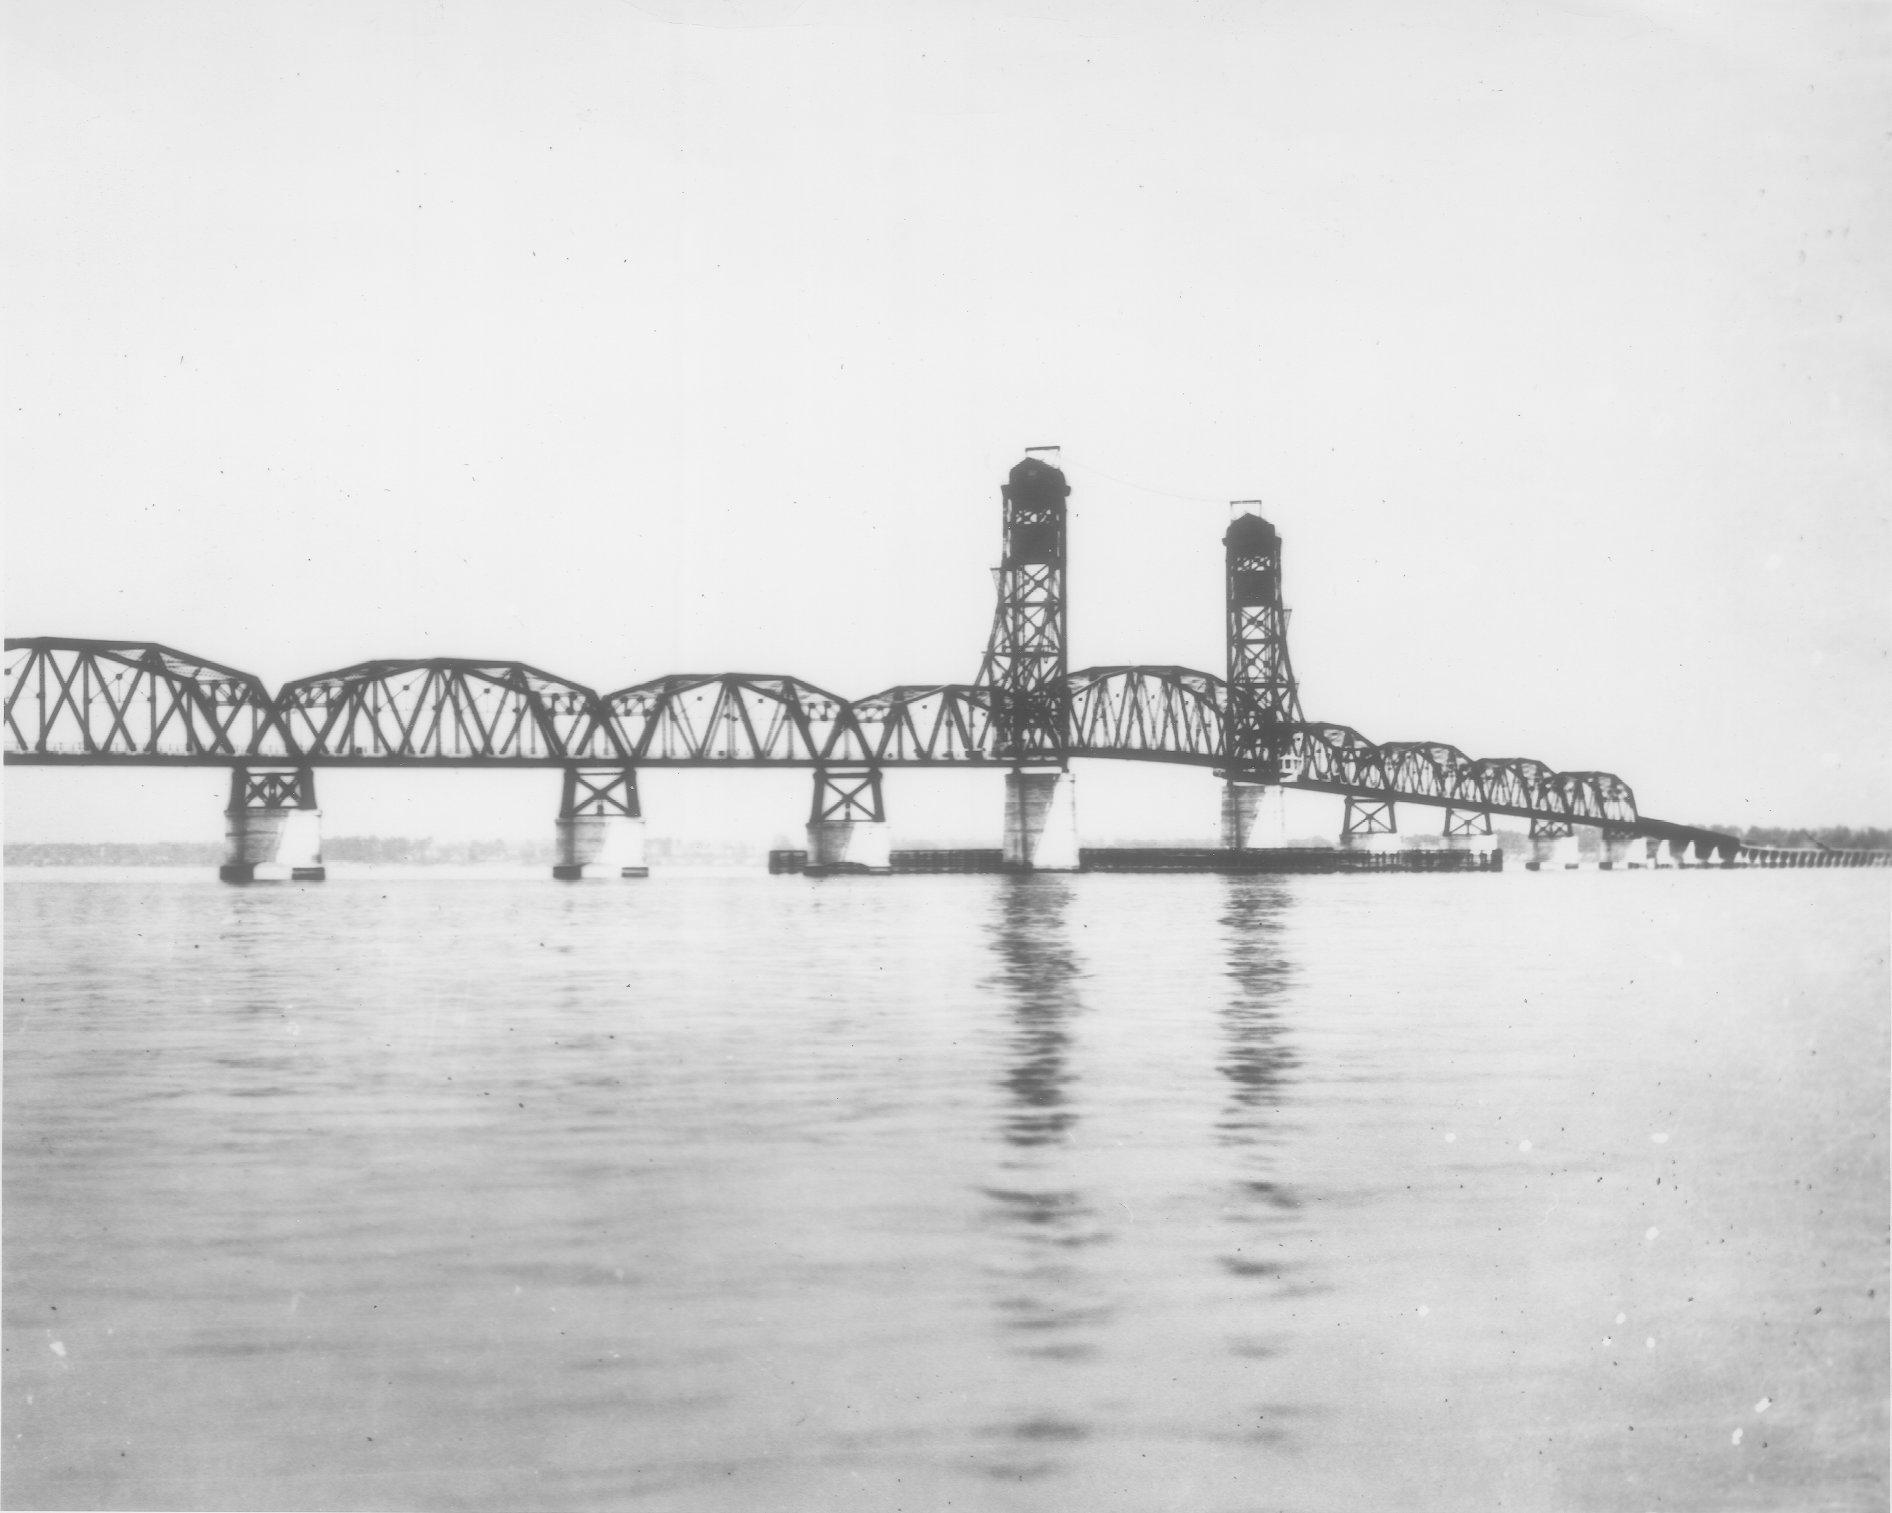 Drawn river bridge World's the 1928 Bridge on